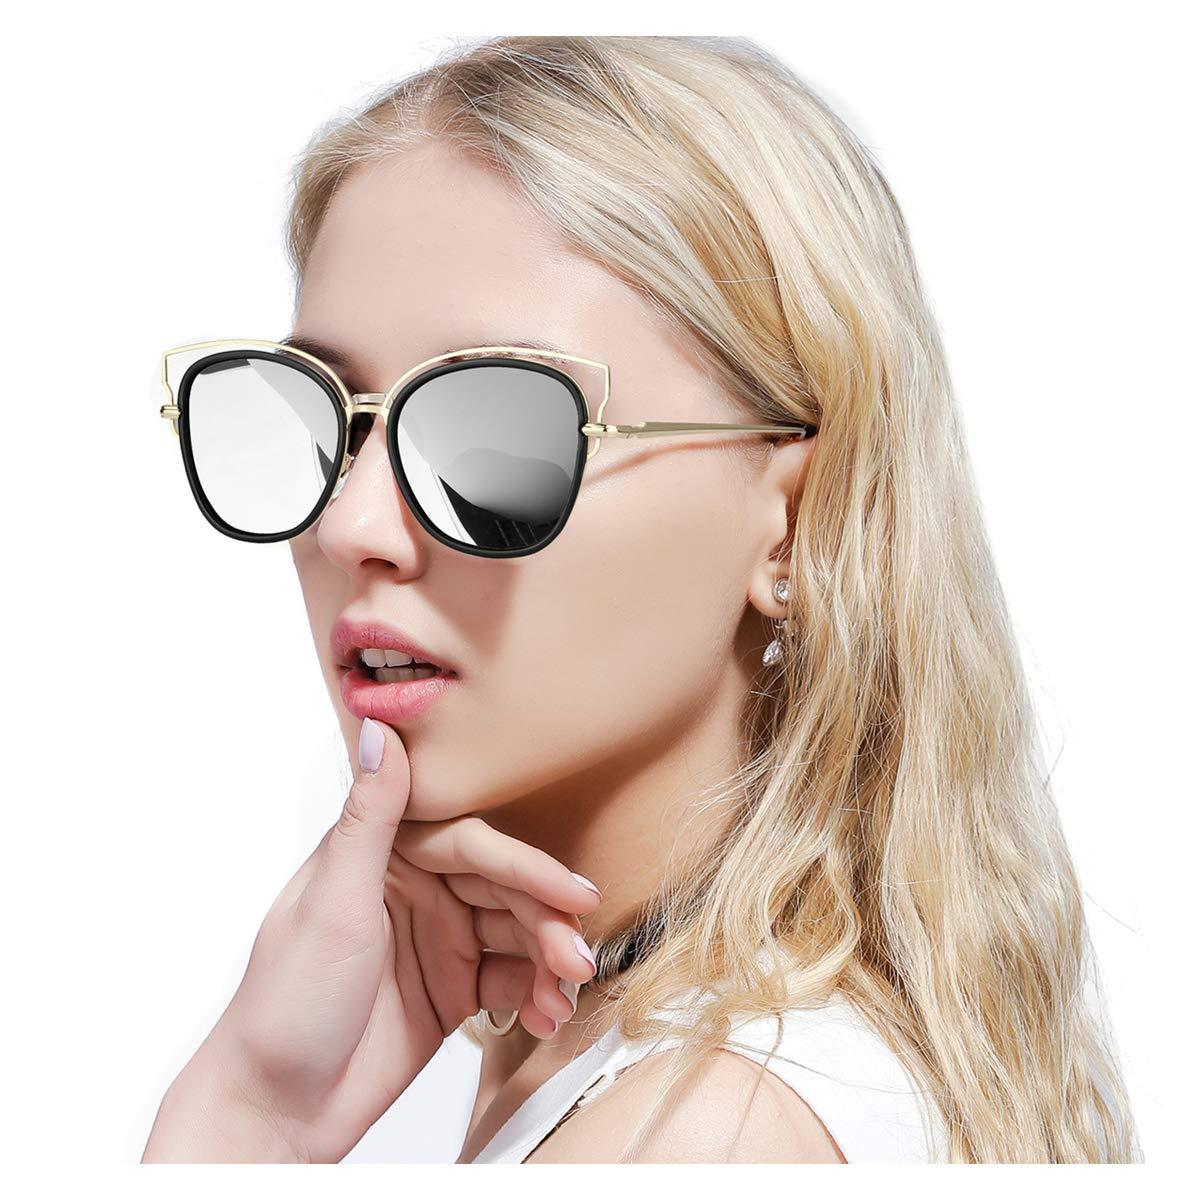 Black Silver FIMILU Oversized Cateye Mirrored Sunglasses for Women,HD Polarized Lenses & UV400 Predection Stylish Eyewear